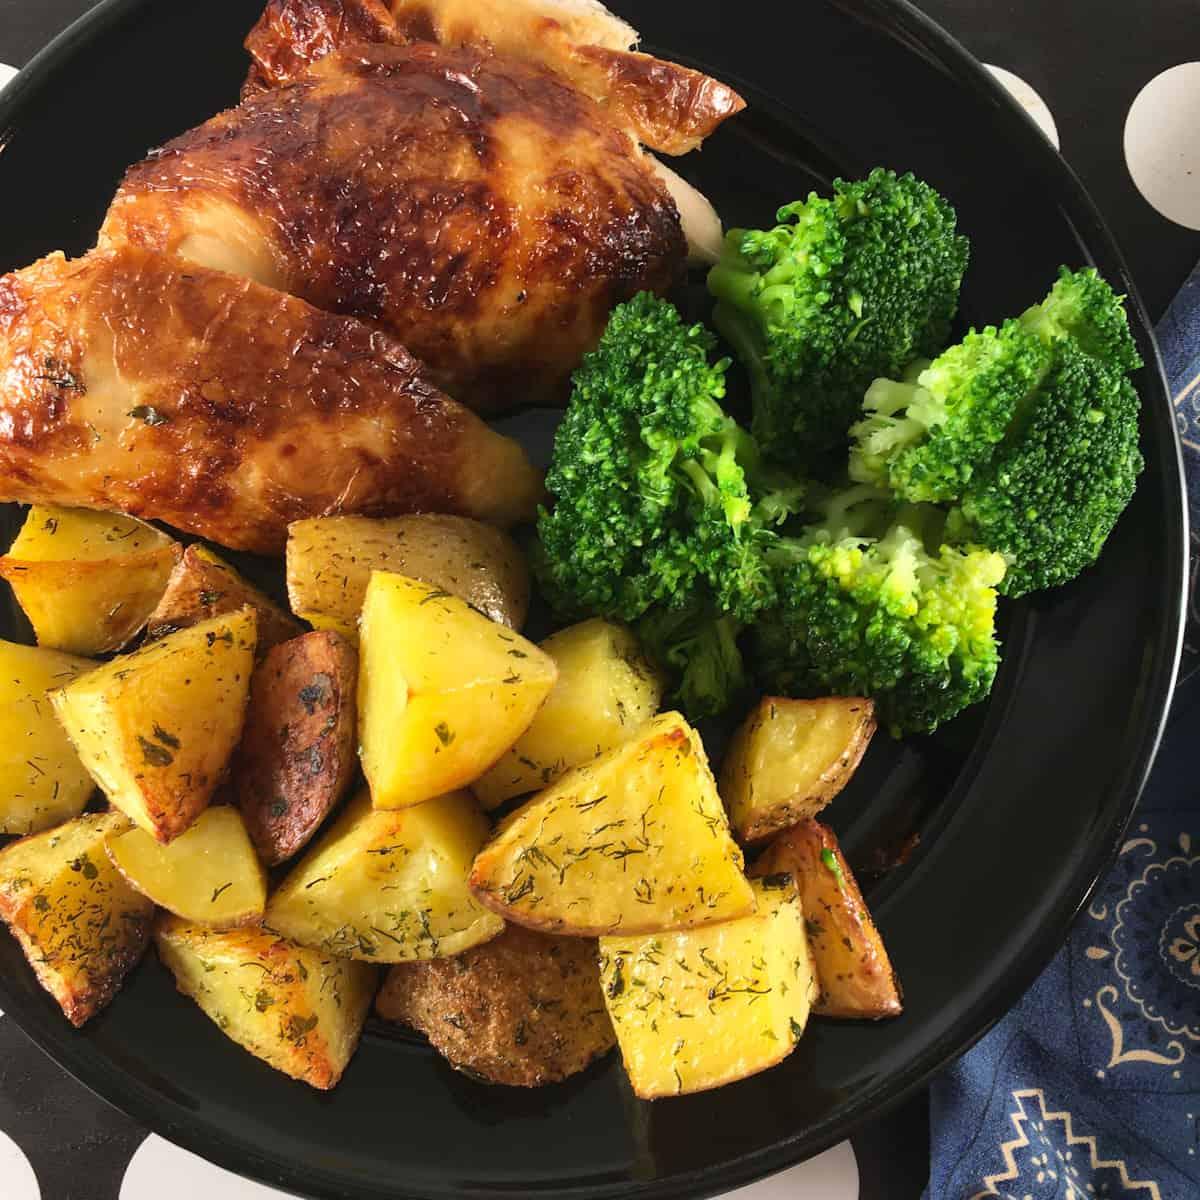 leftover rotisserie chicken air fryer meal